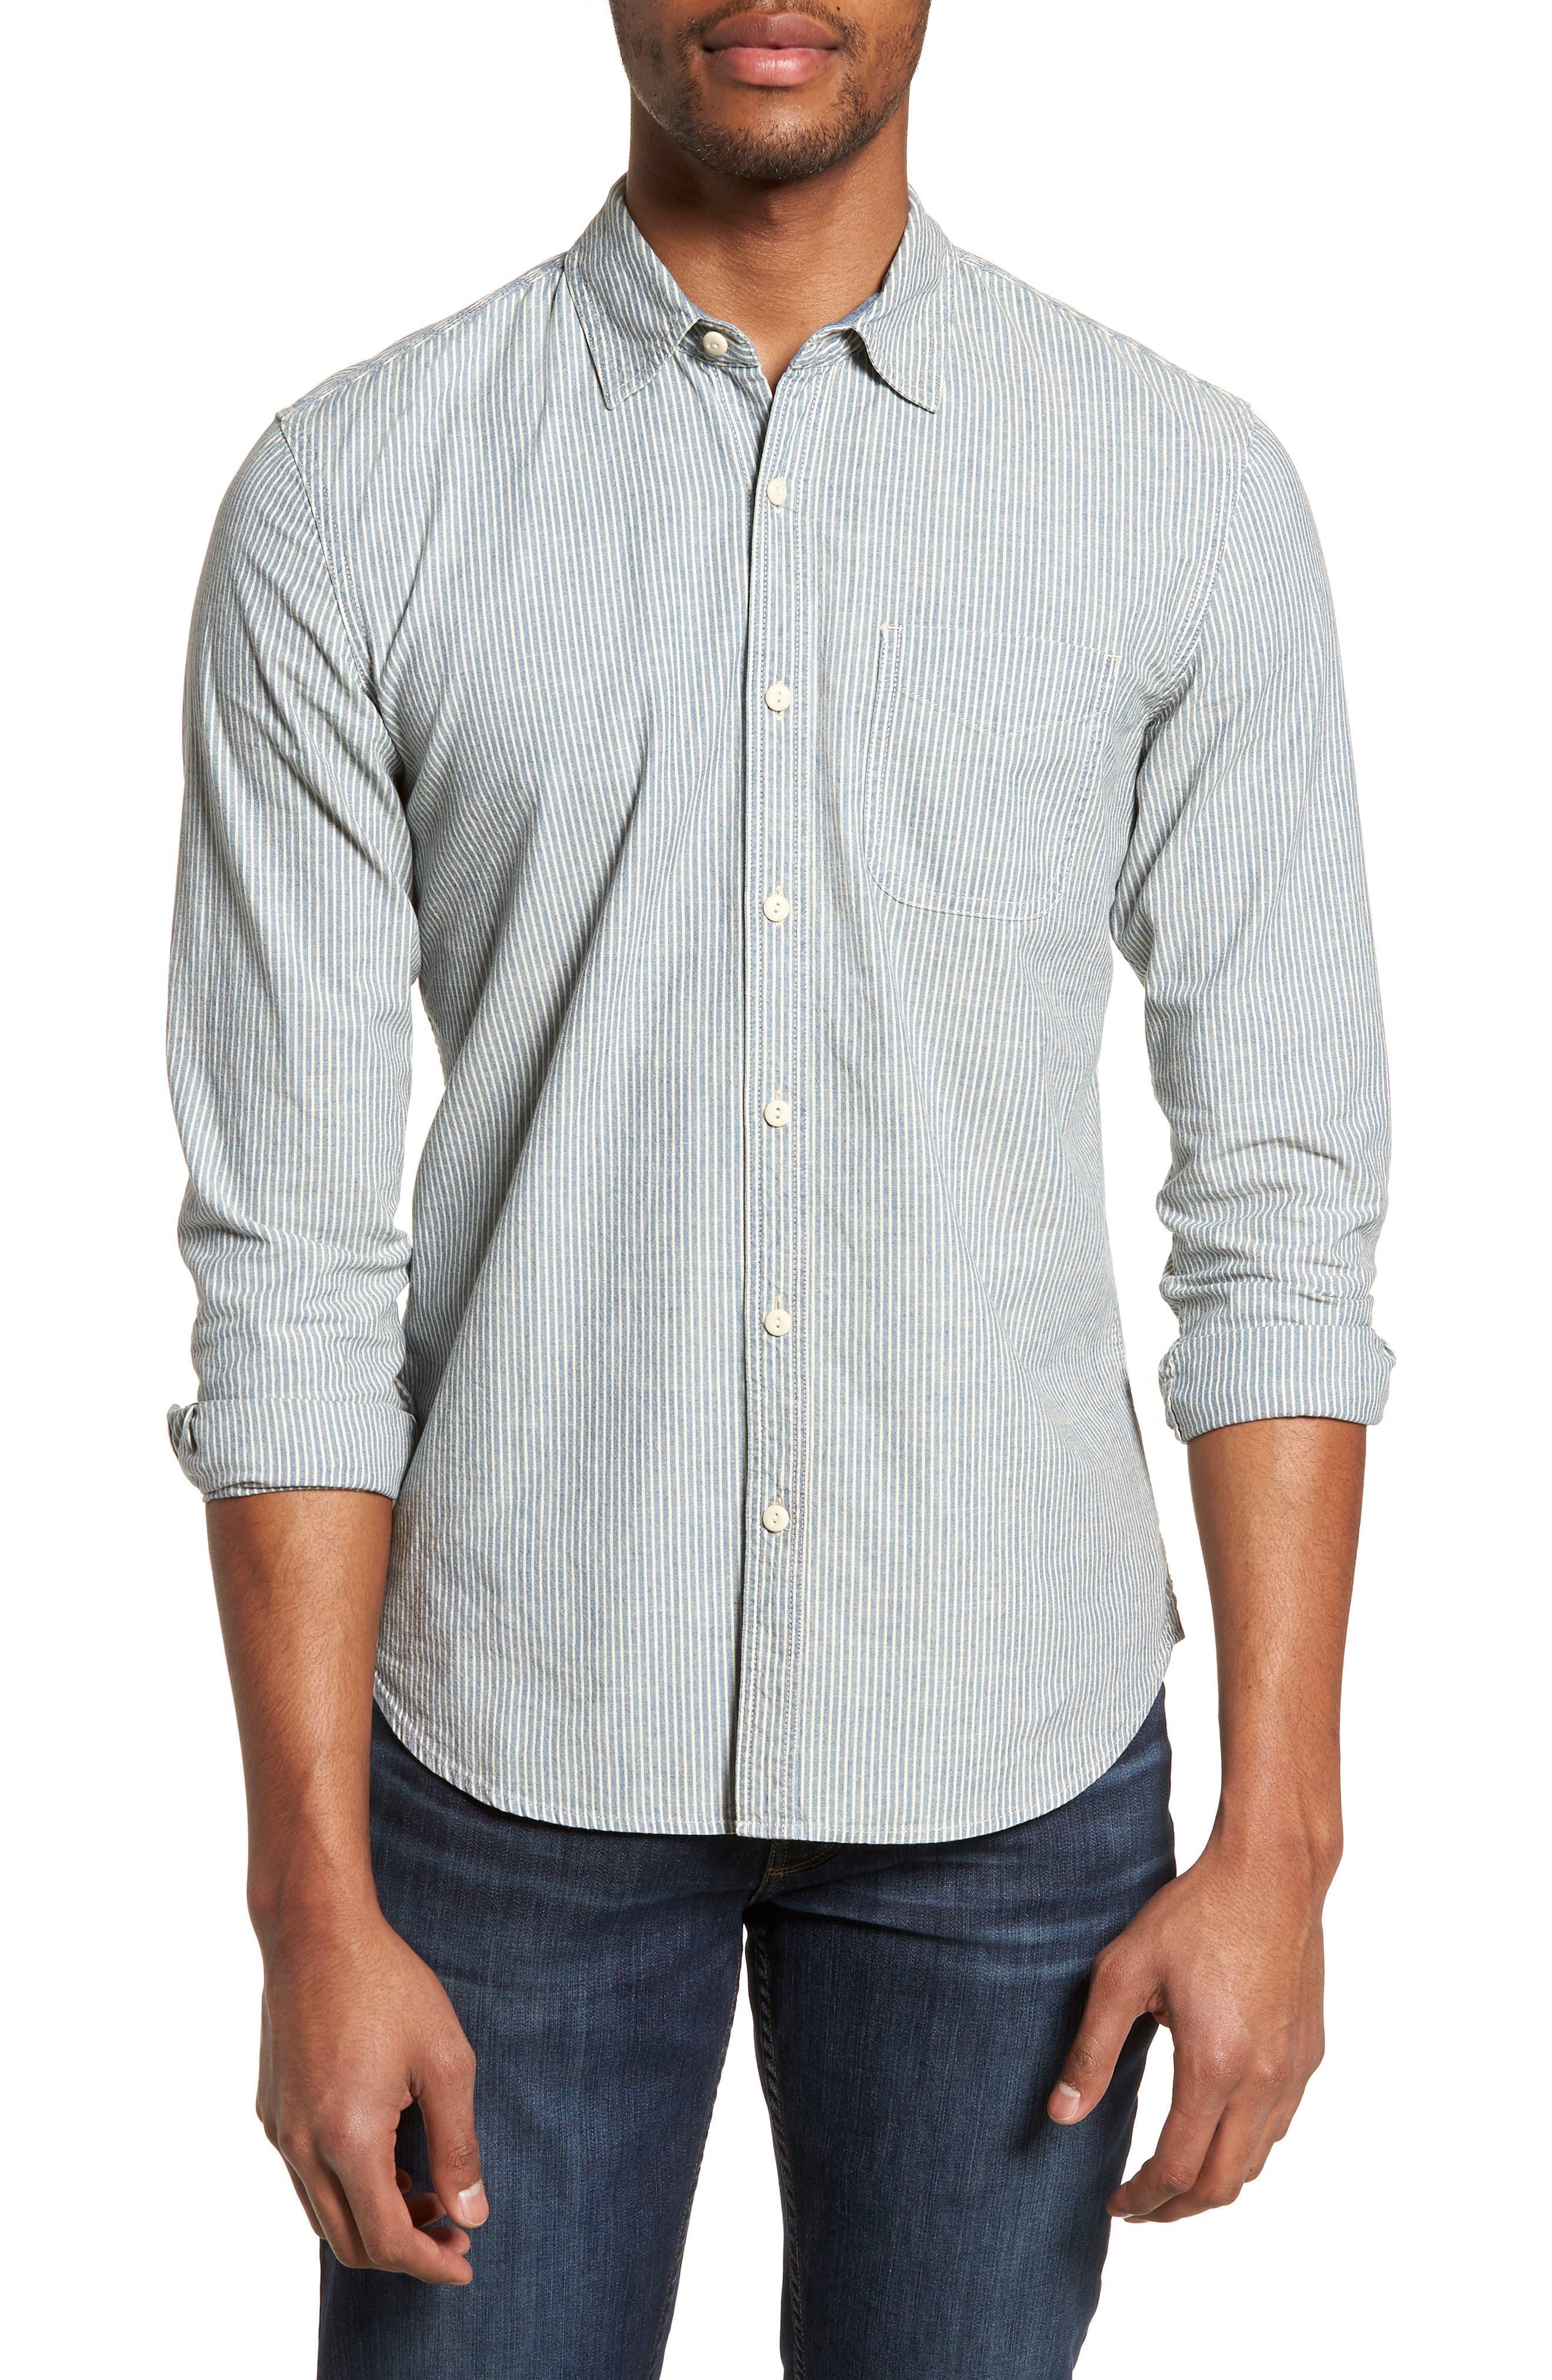 Nelson Slim Fit Stripe Sport Shirt,                         Main,                         color, Indigo/ White Stripe